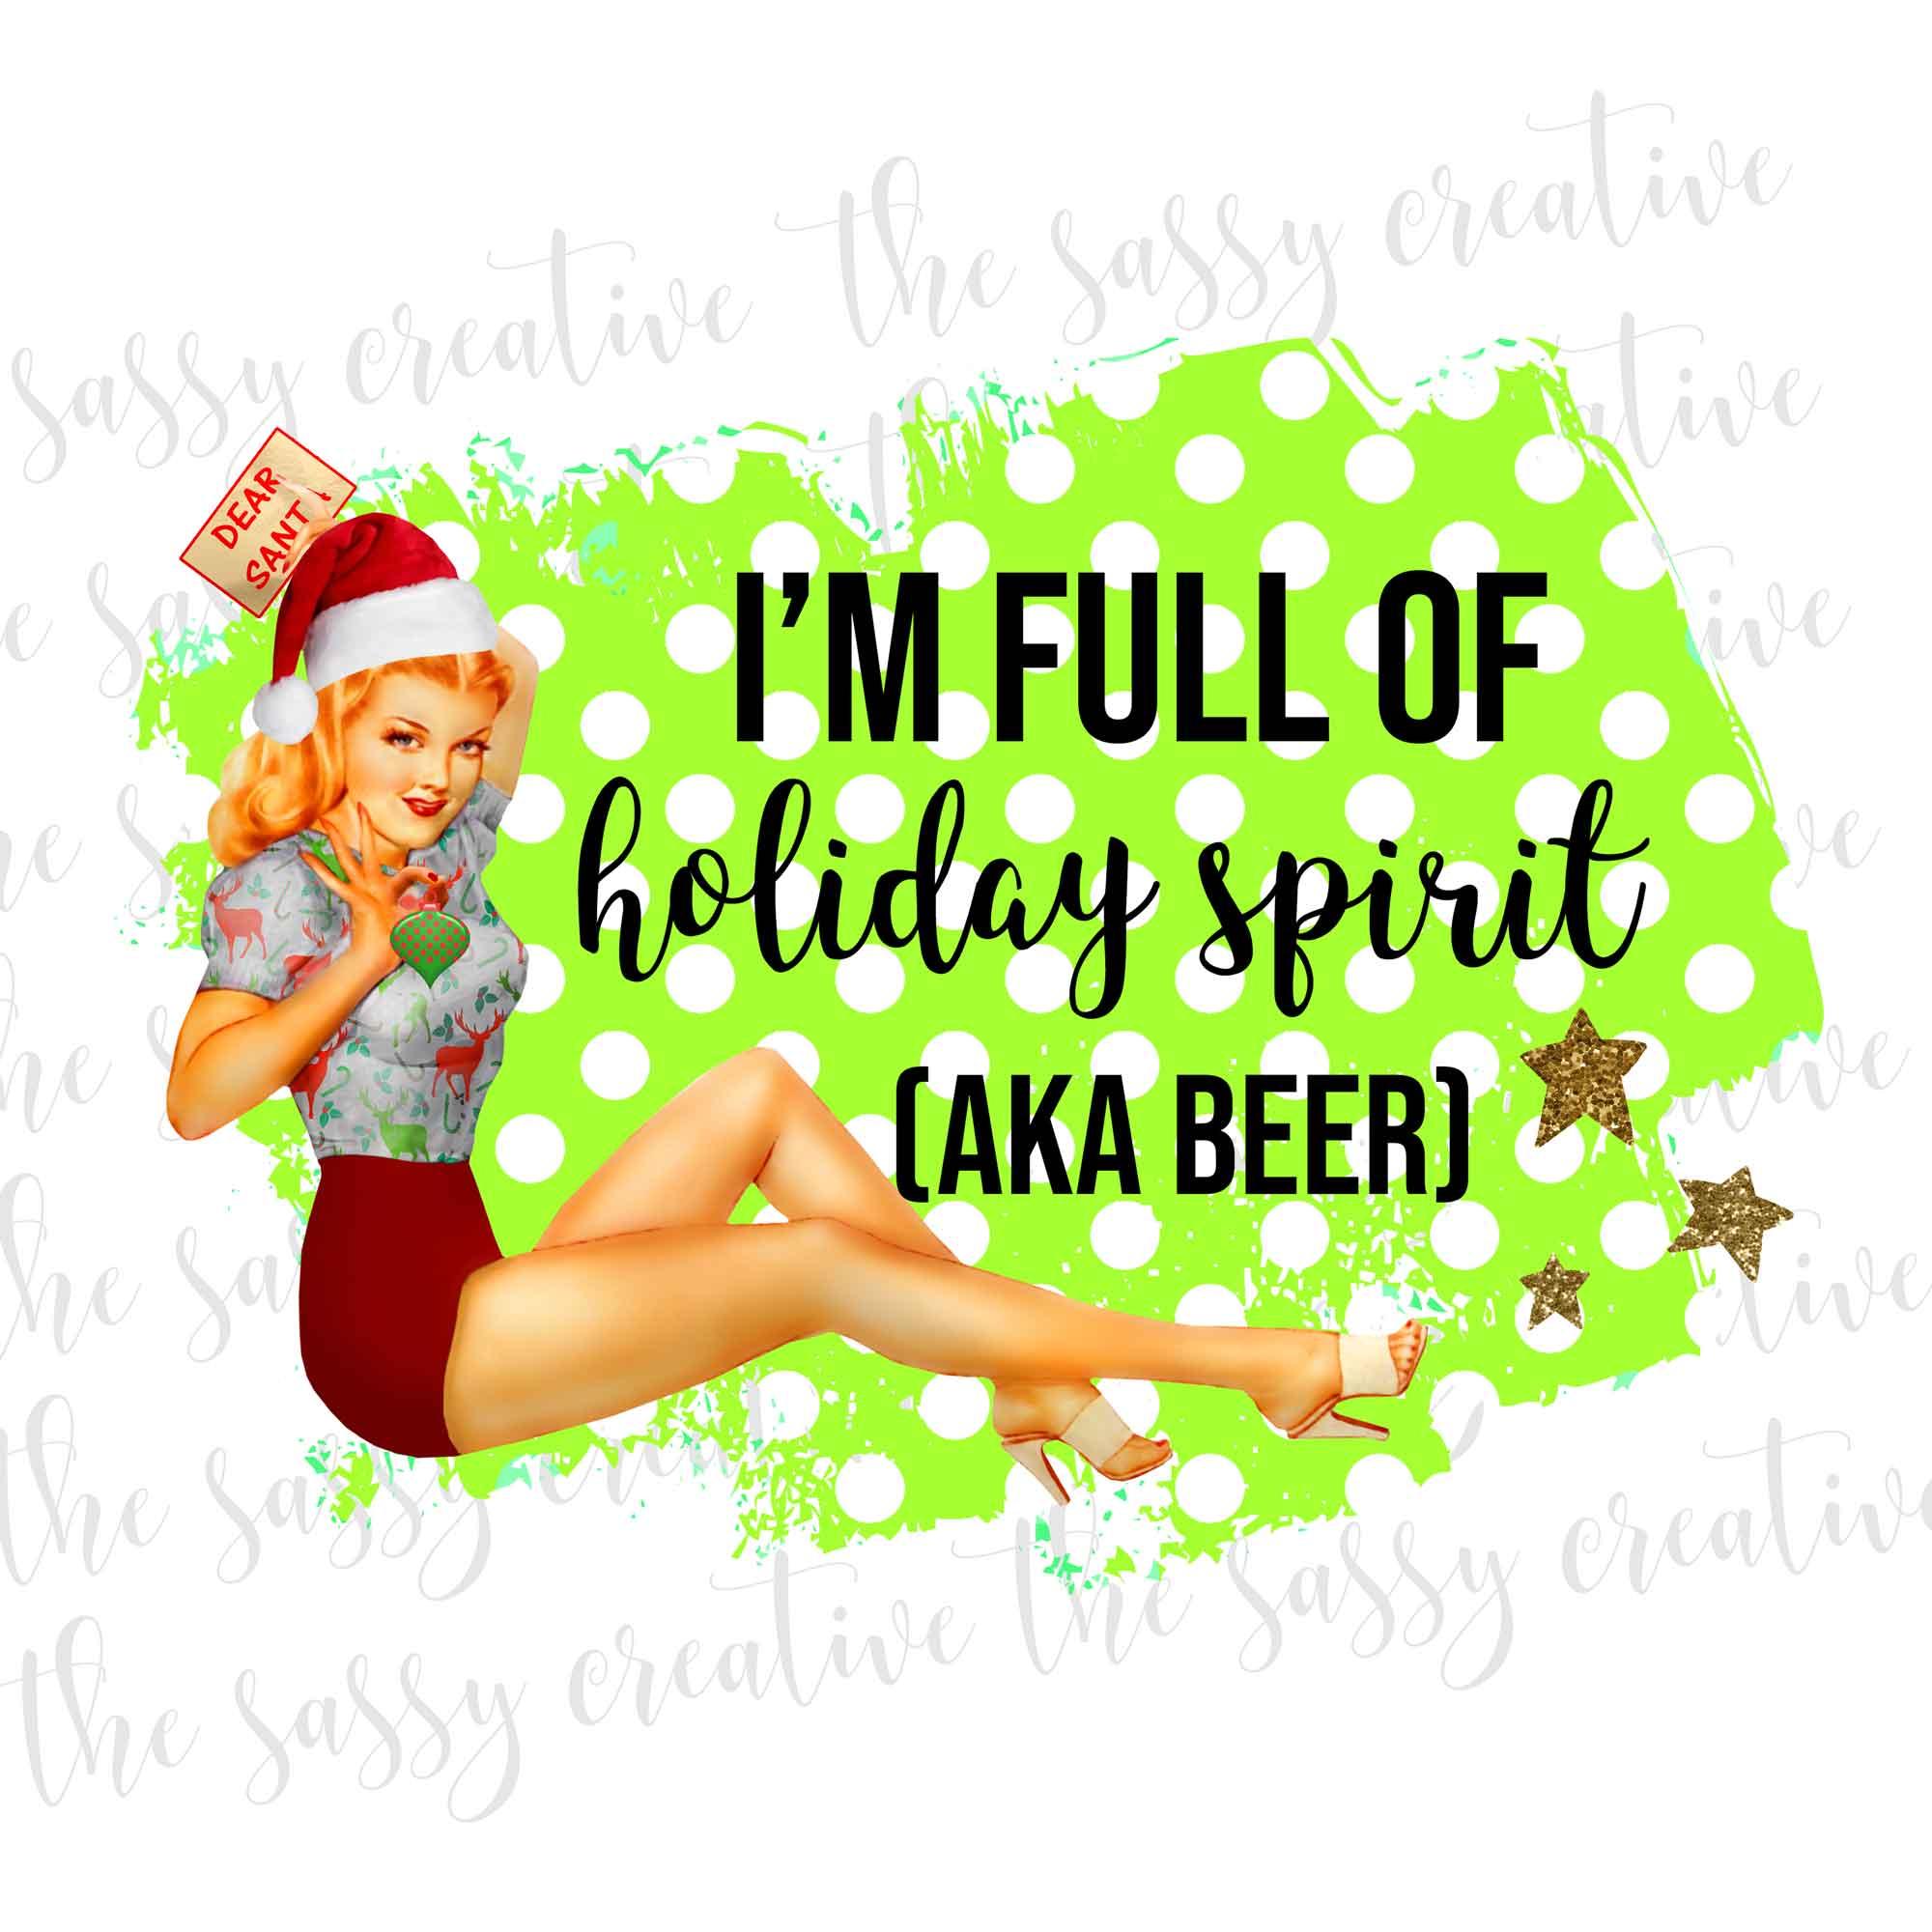 holidayspiritbeercover